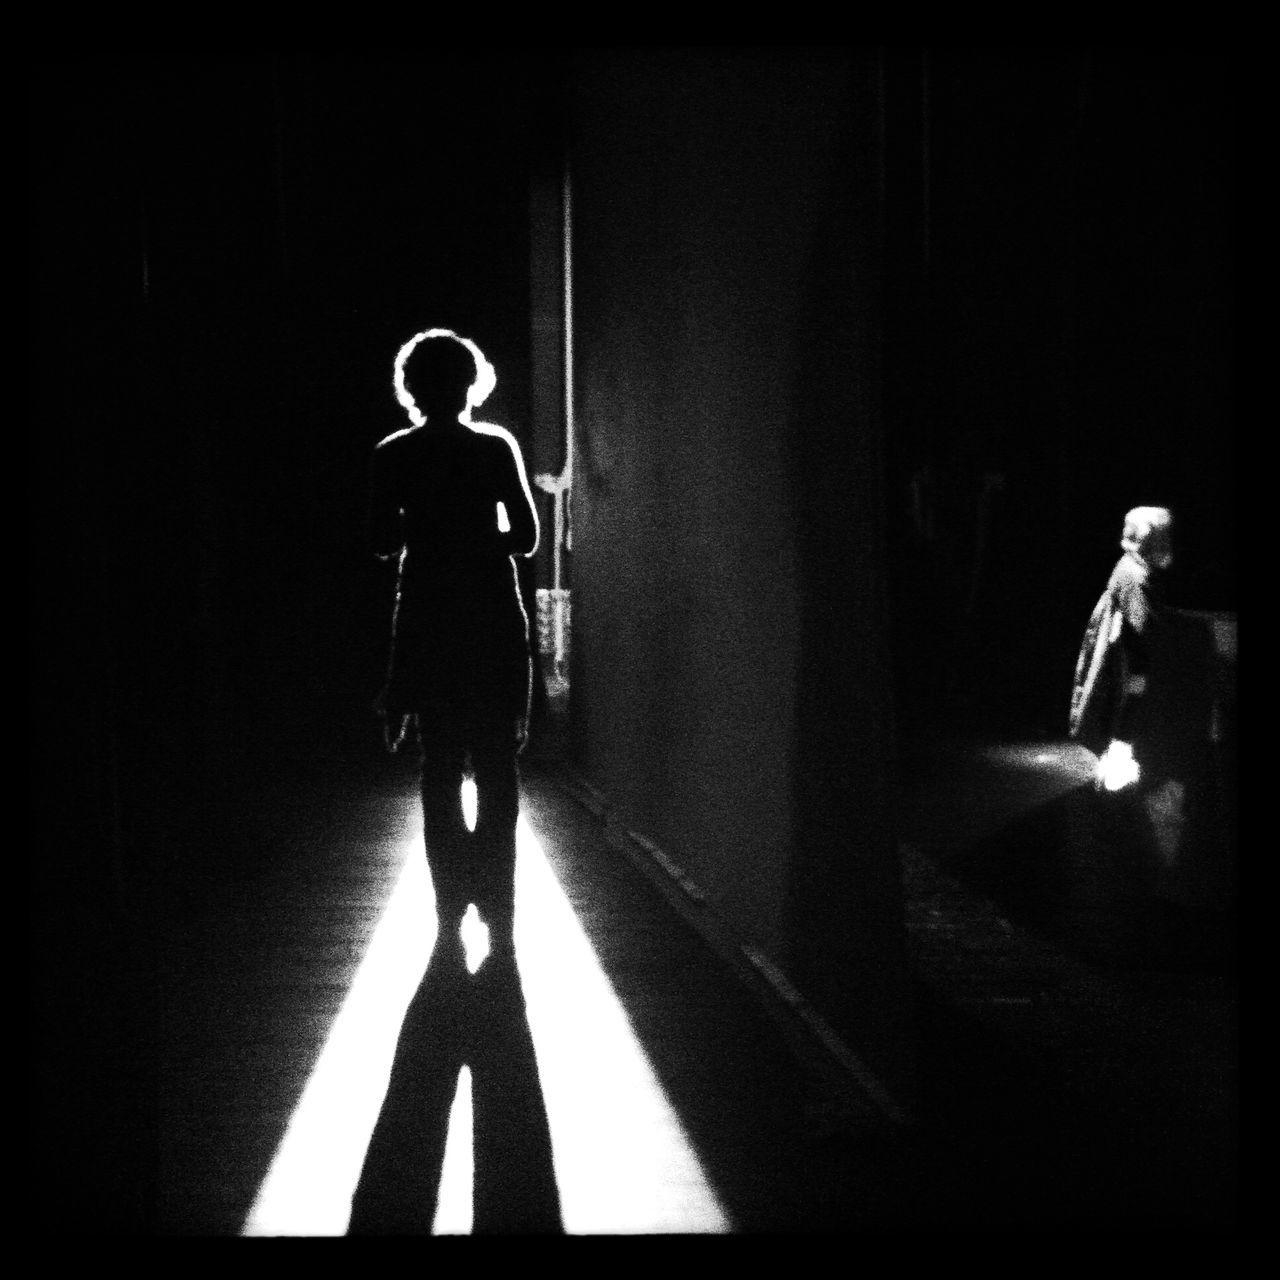 Silhouette woman walking in the dark